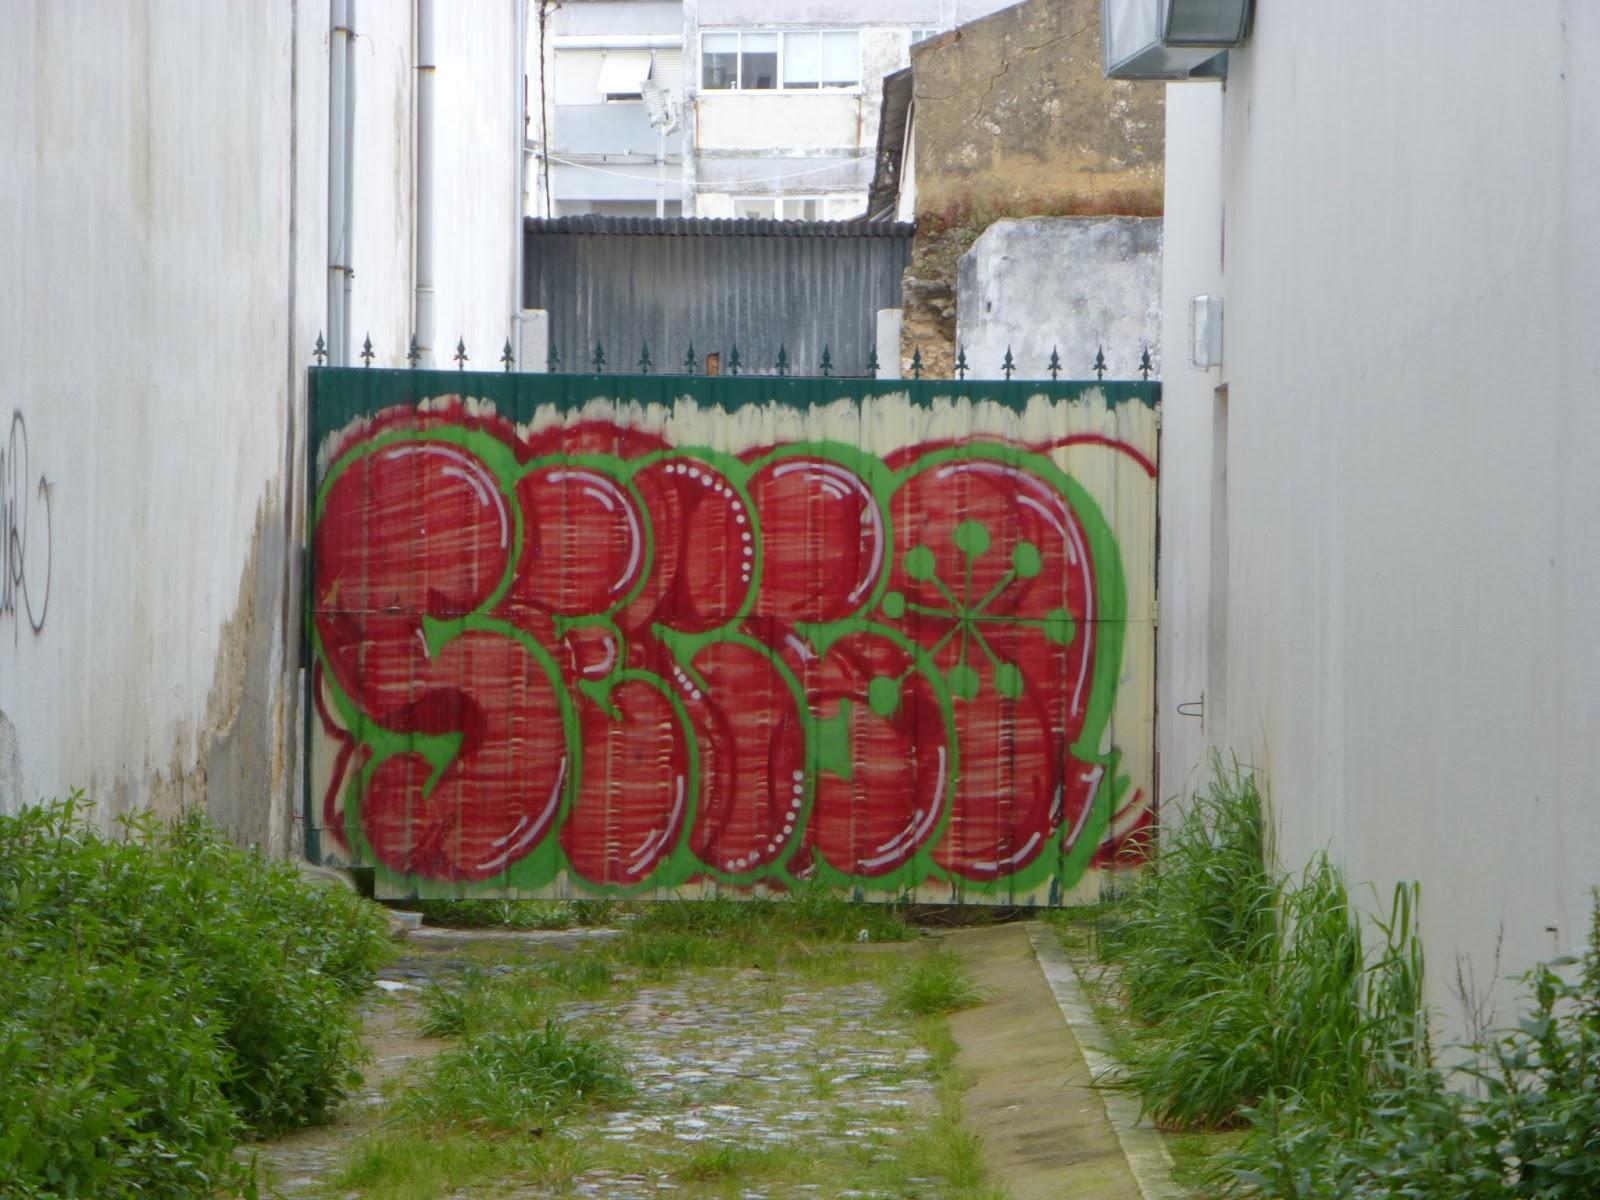 The graffiti of setubal